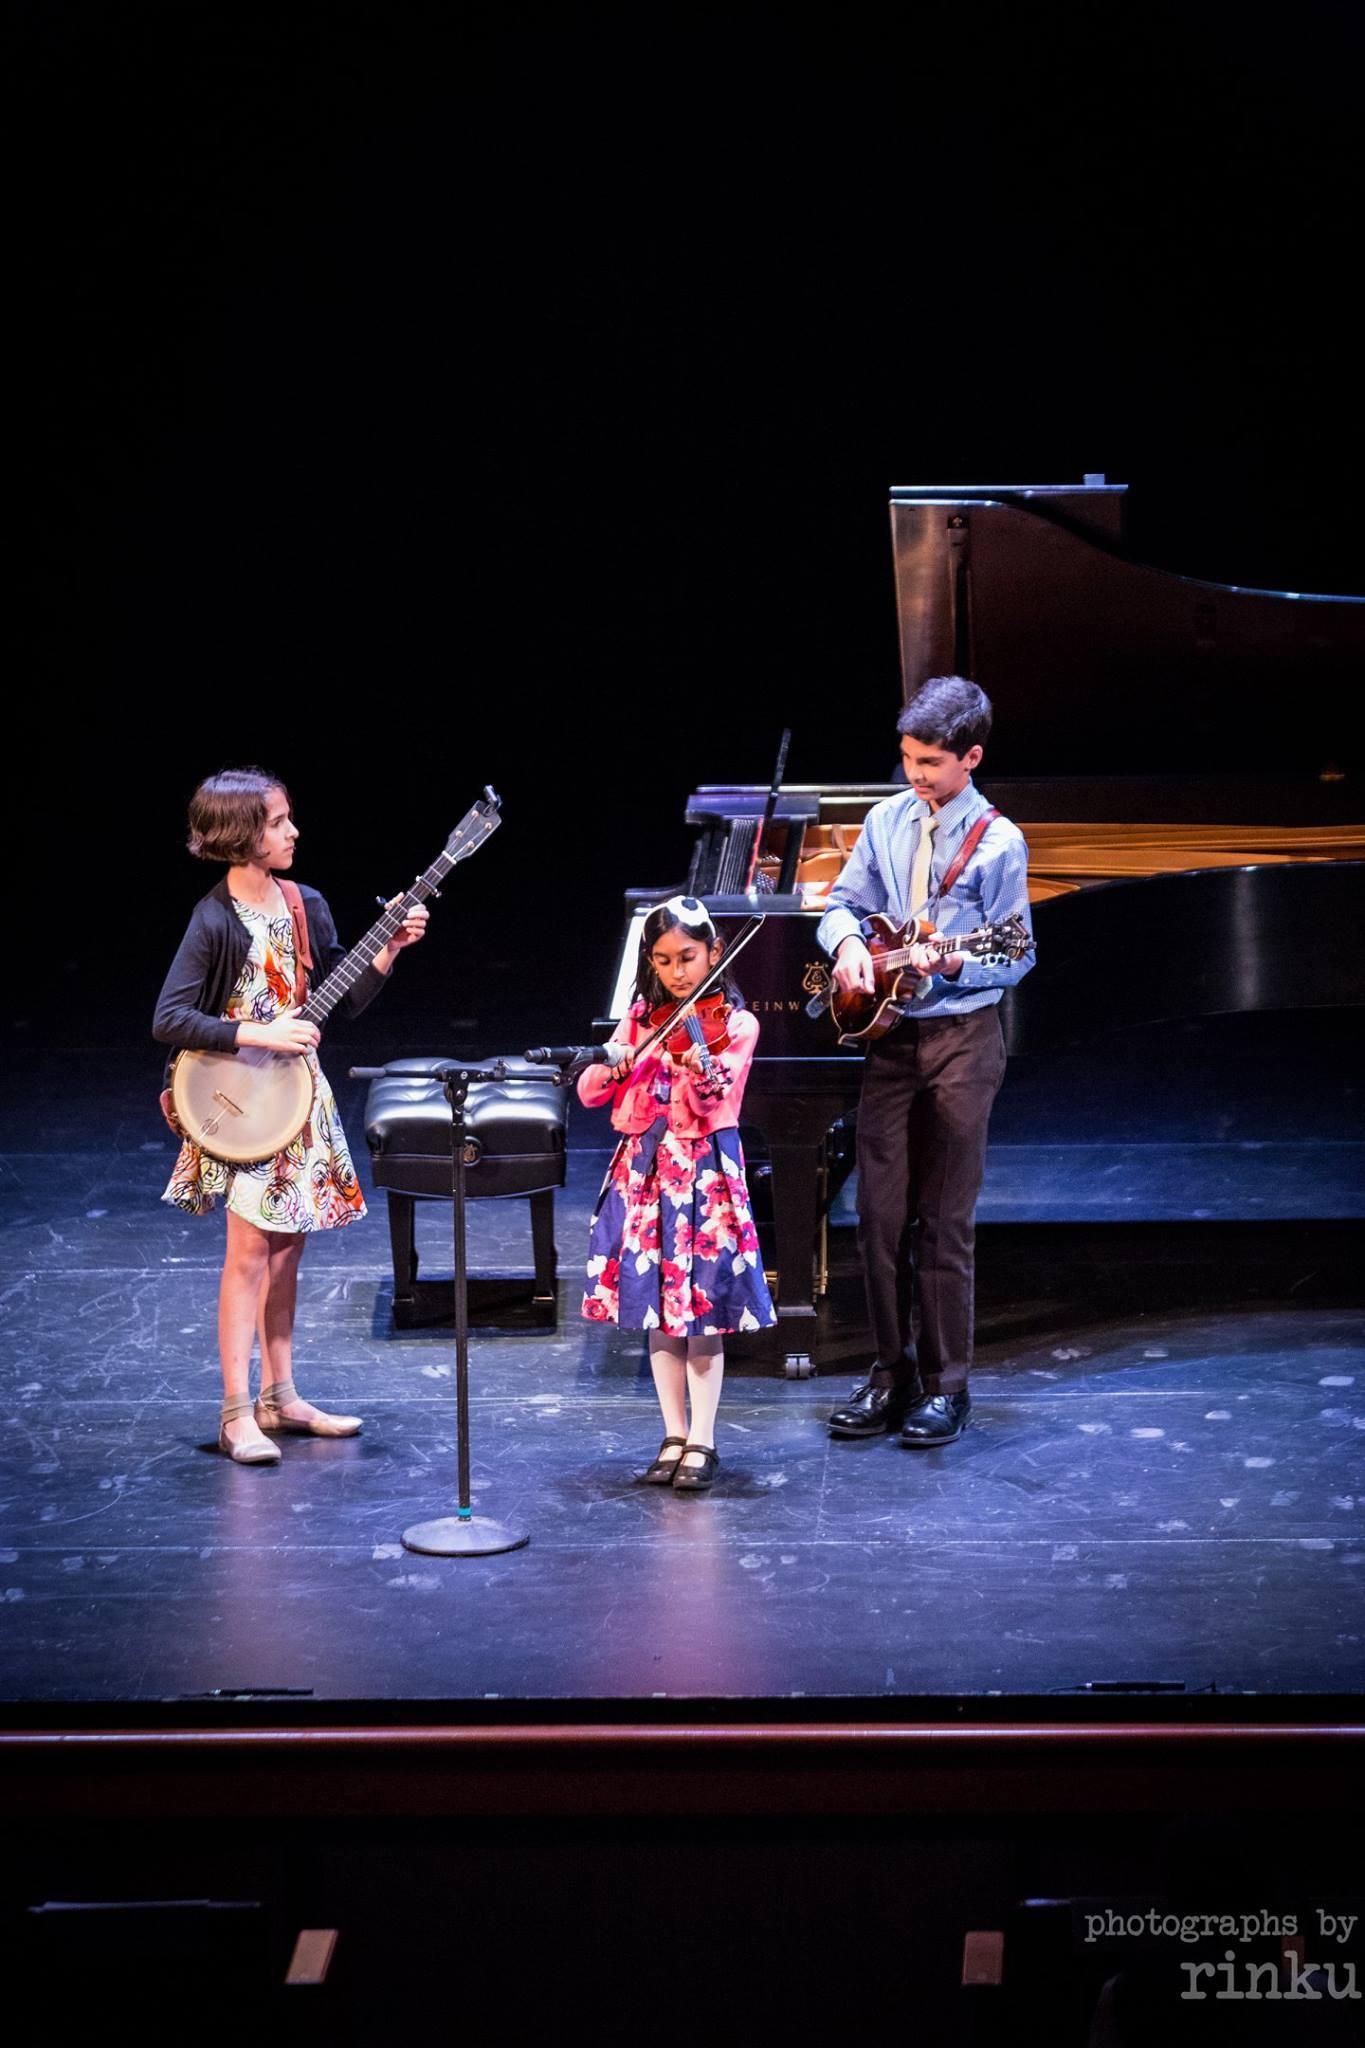 Giri and Uma Peters perform in Washington D.C.